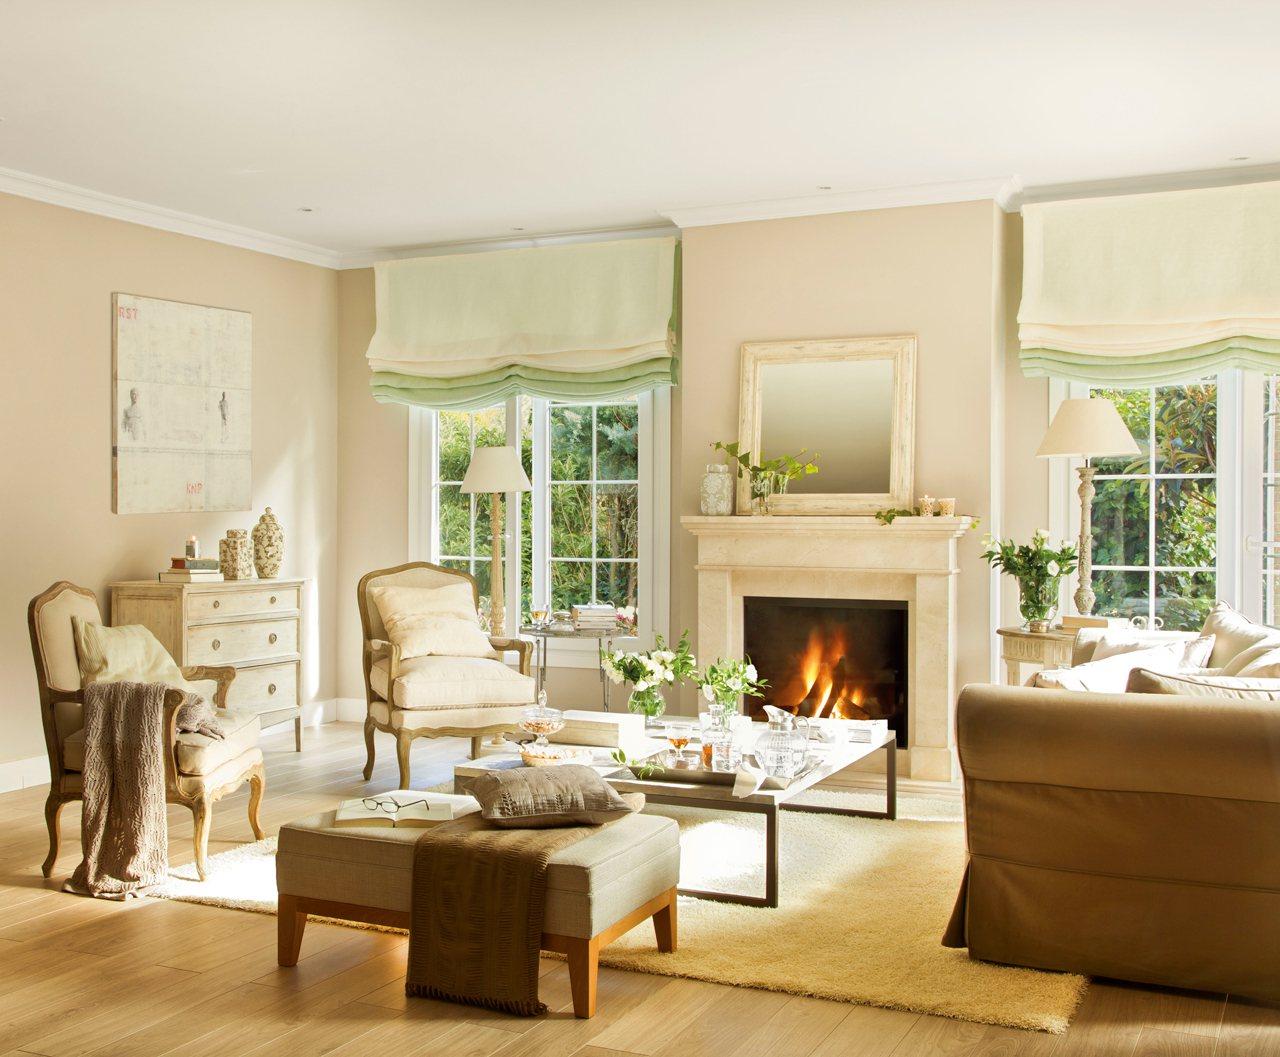 50 consejos para ahorrar en casa for Chimeneas en apartamentos pequenos